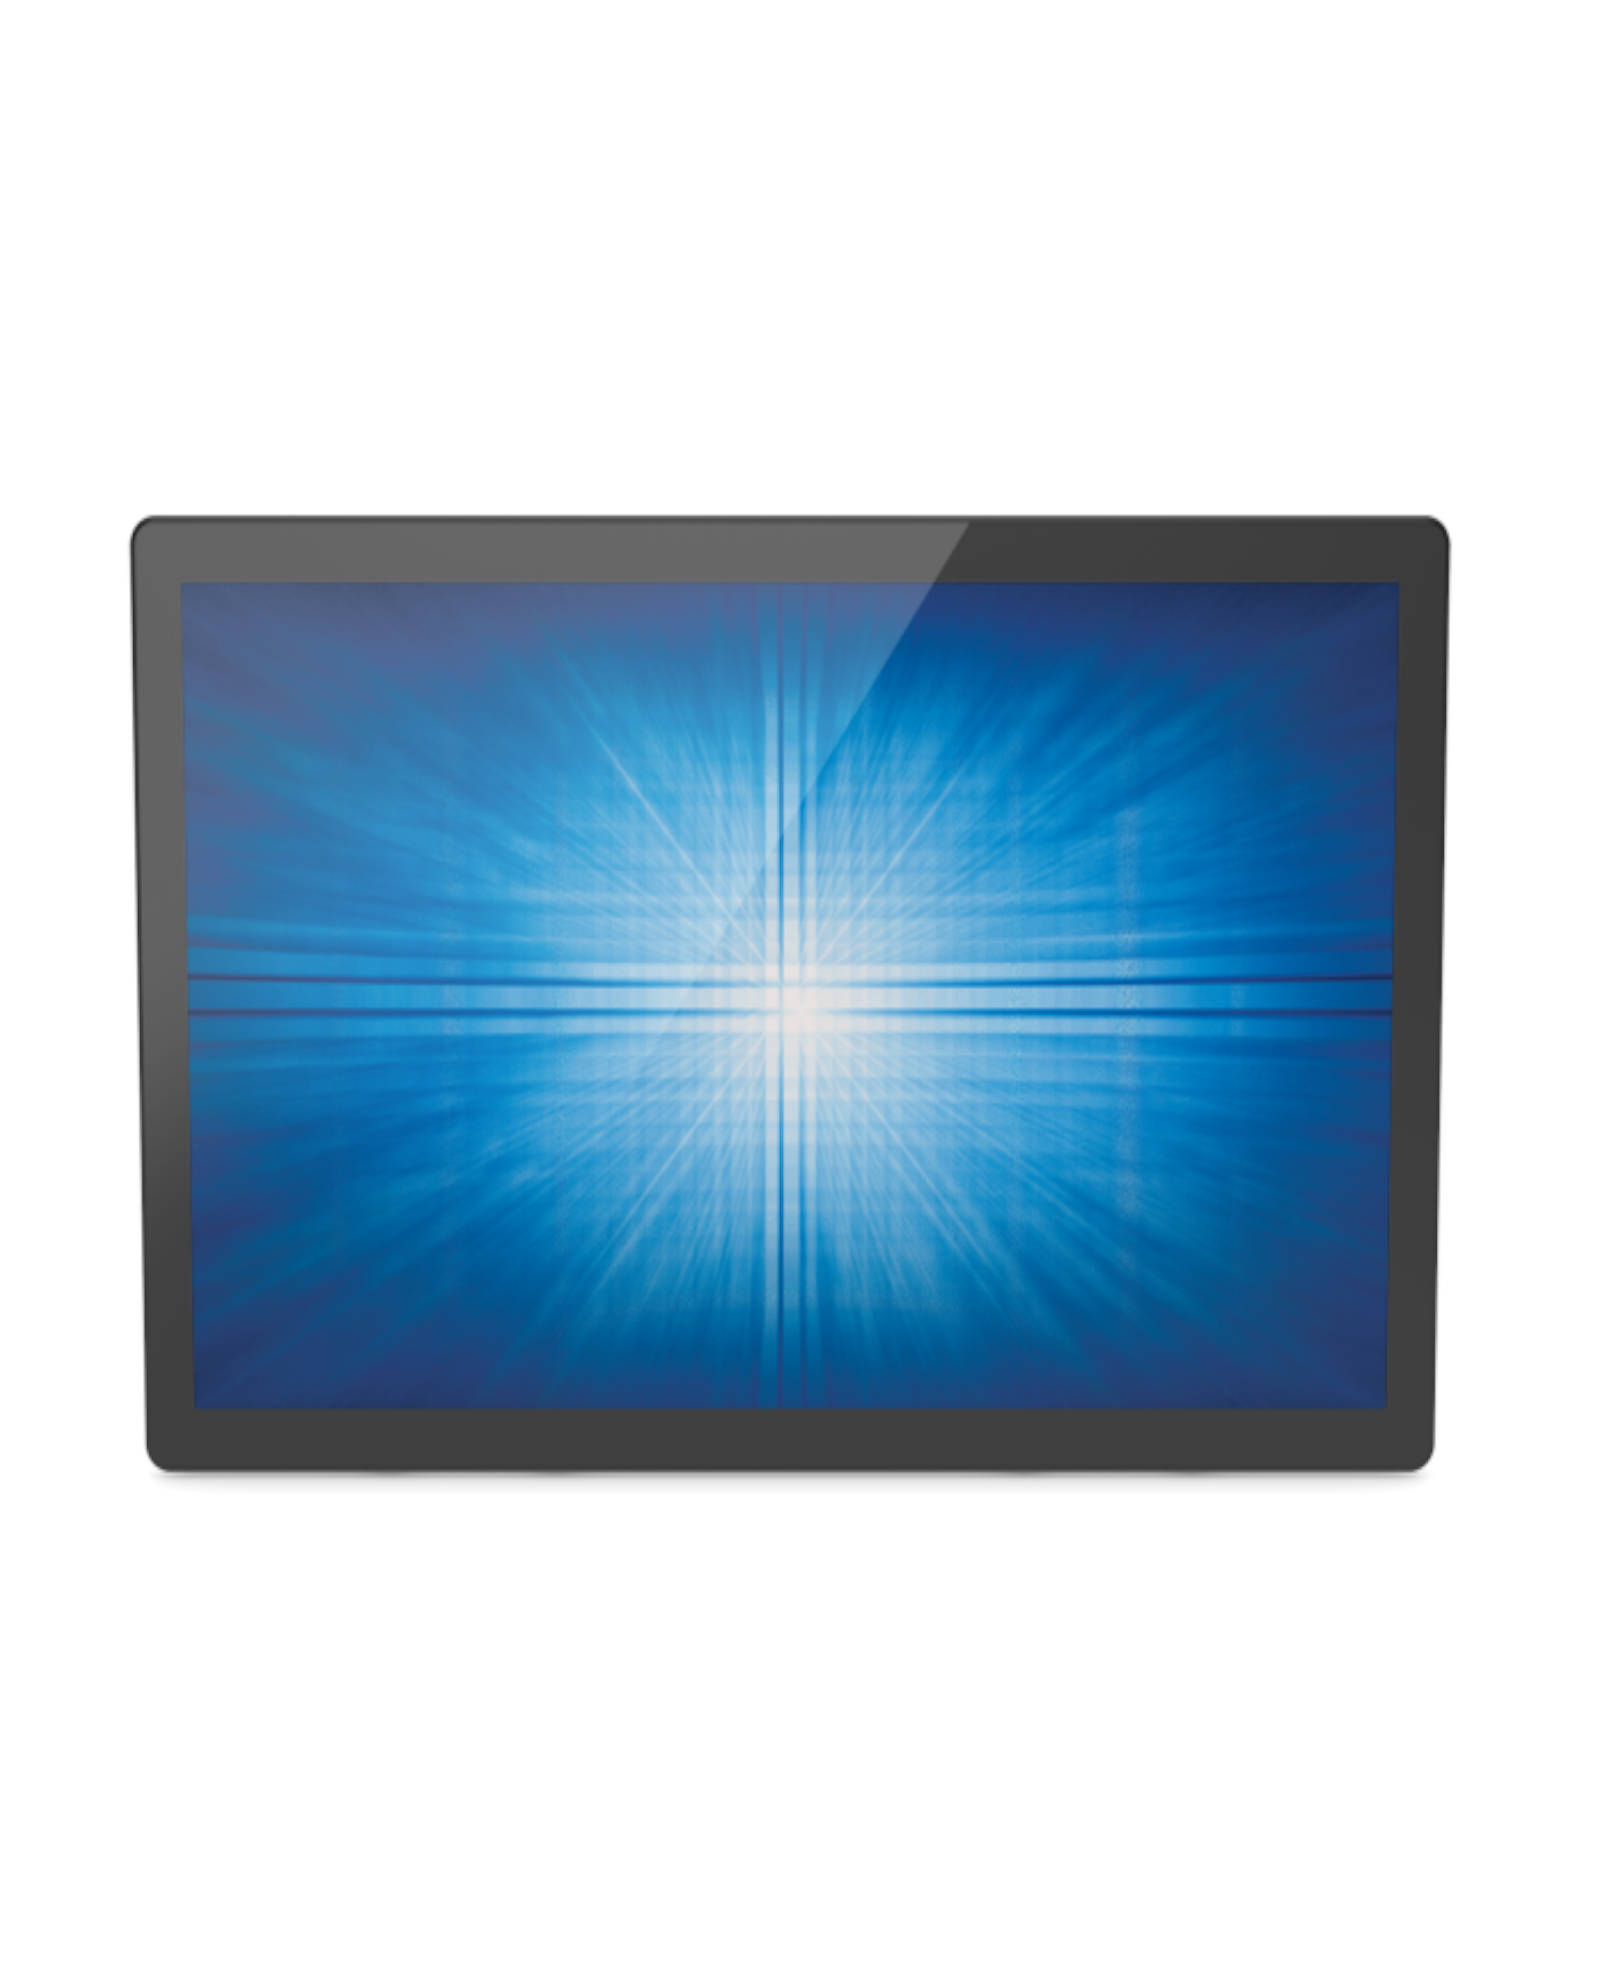 Elo 2494l 23.8inch Open Frame Touchscreen